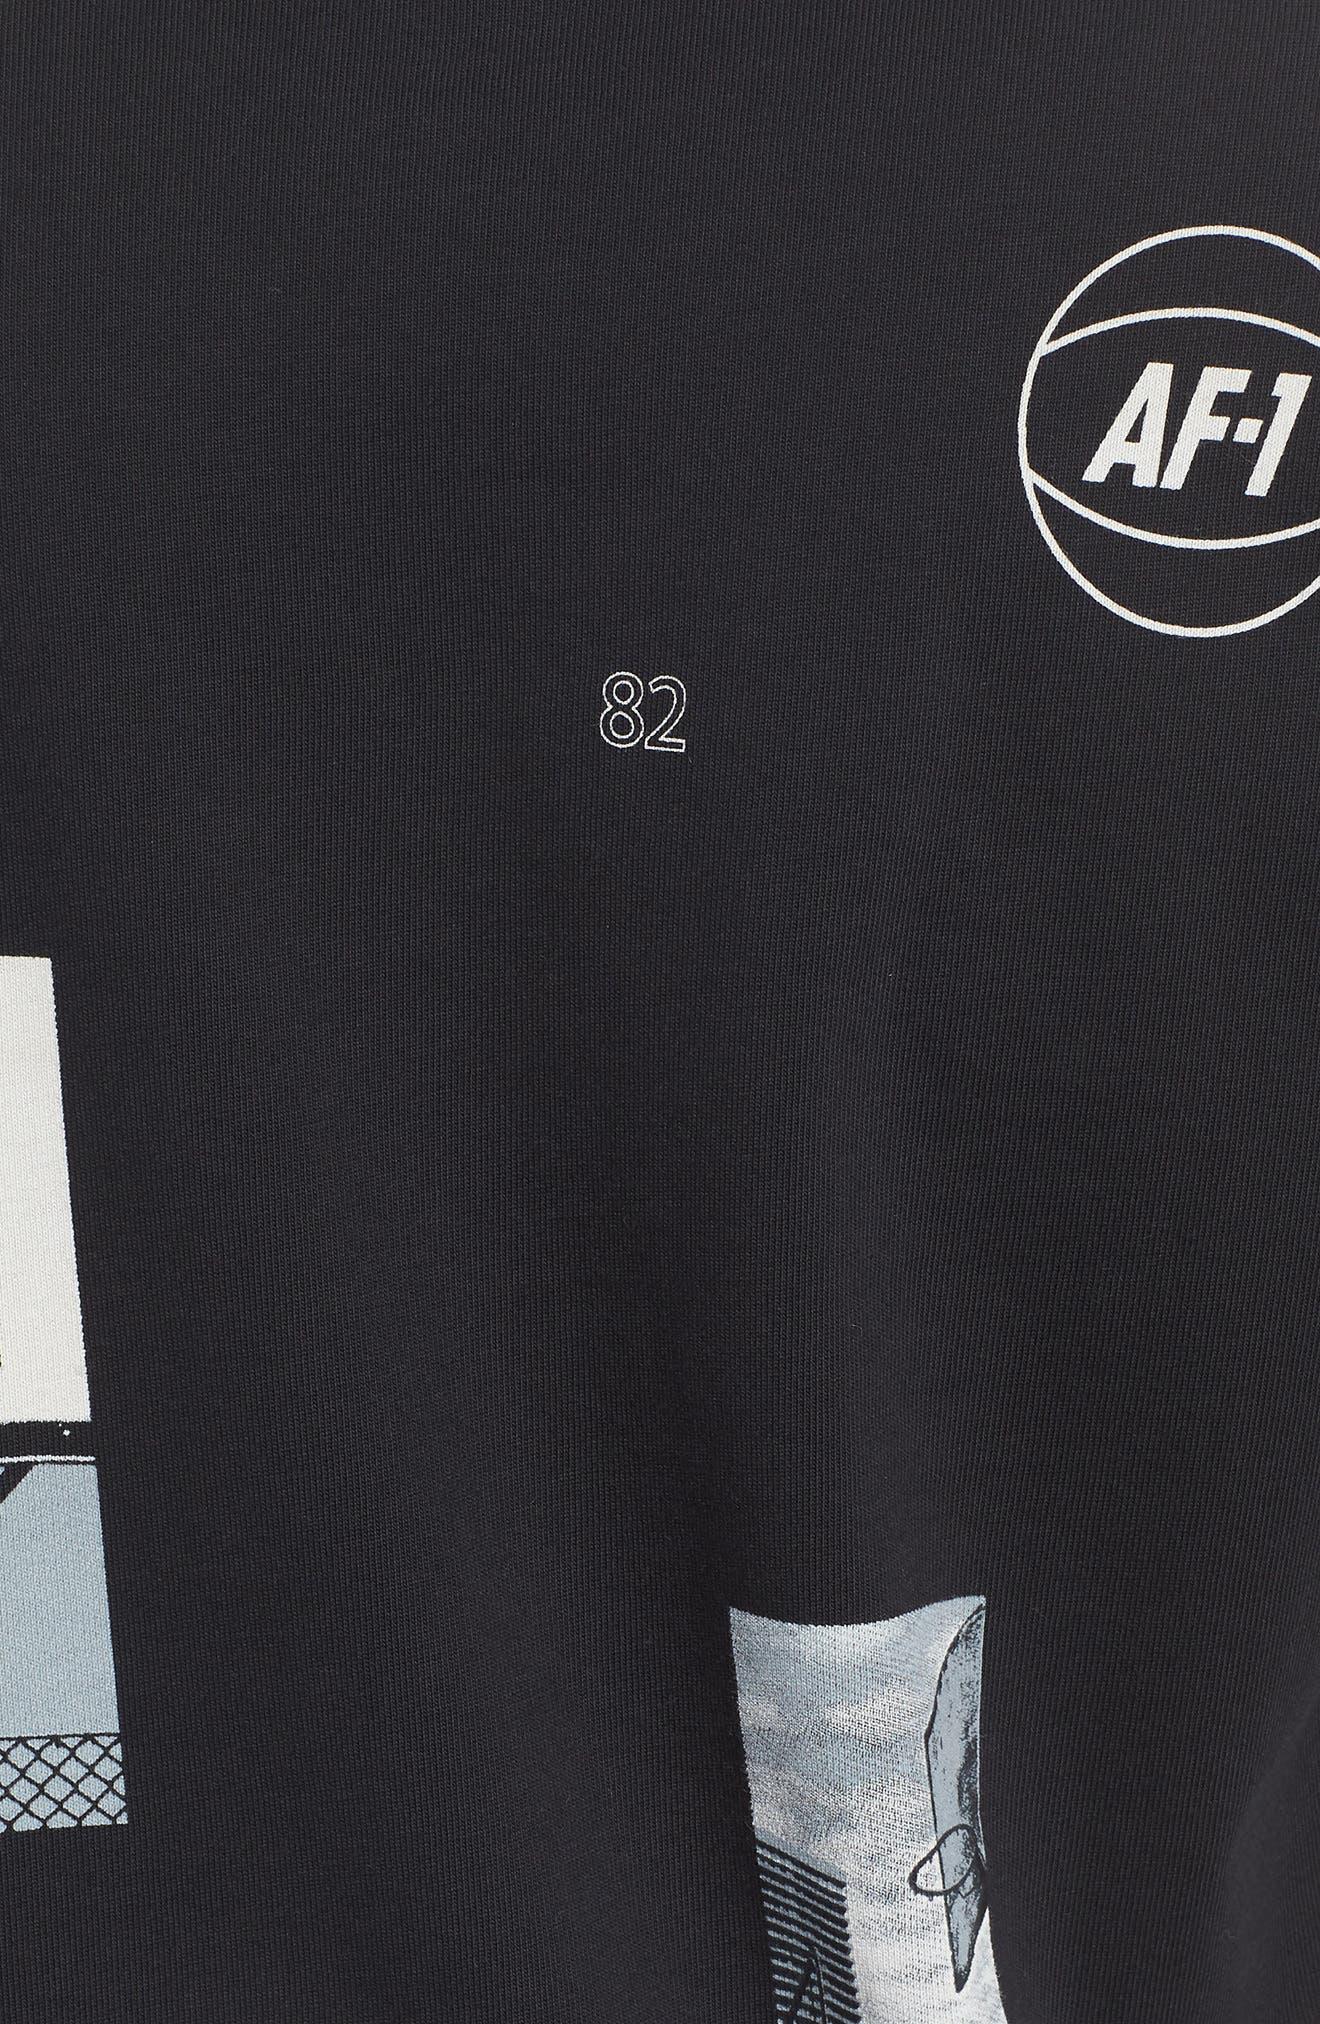 Sportswear AF-1 Oversize T-Shirt,                             Alternate thumbnail 5, color,                             BLACK/ WHITE